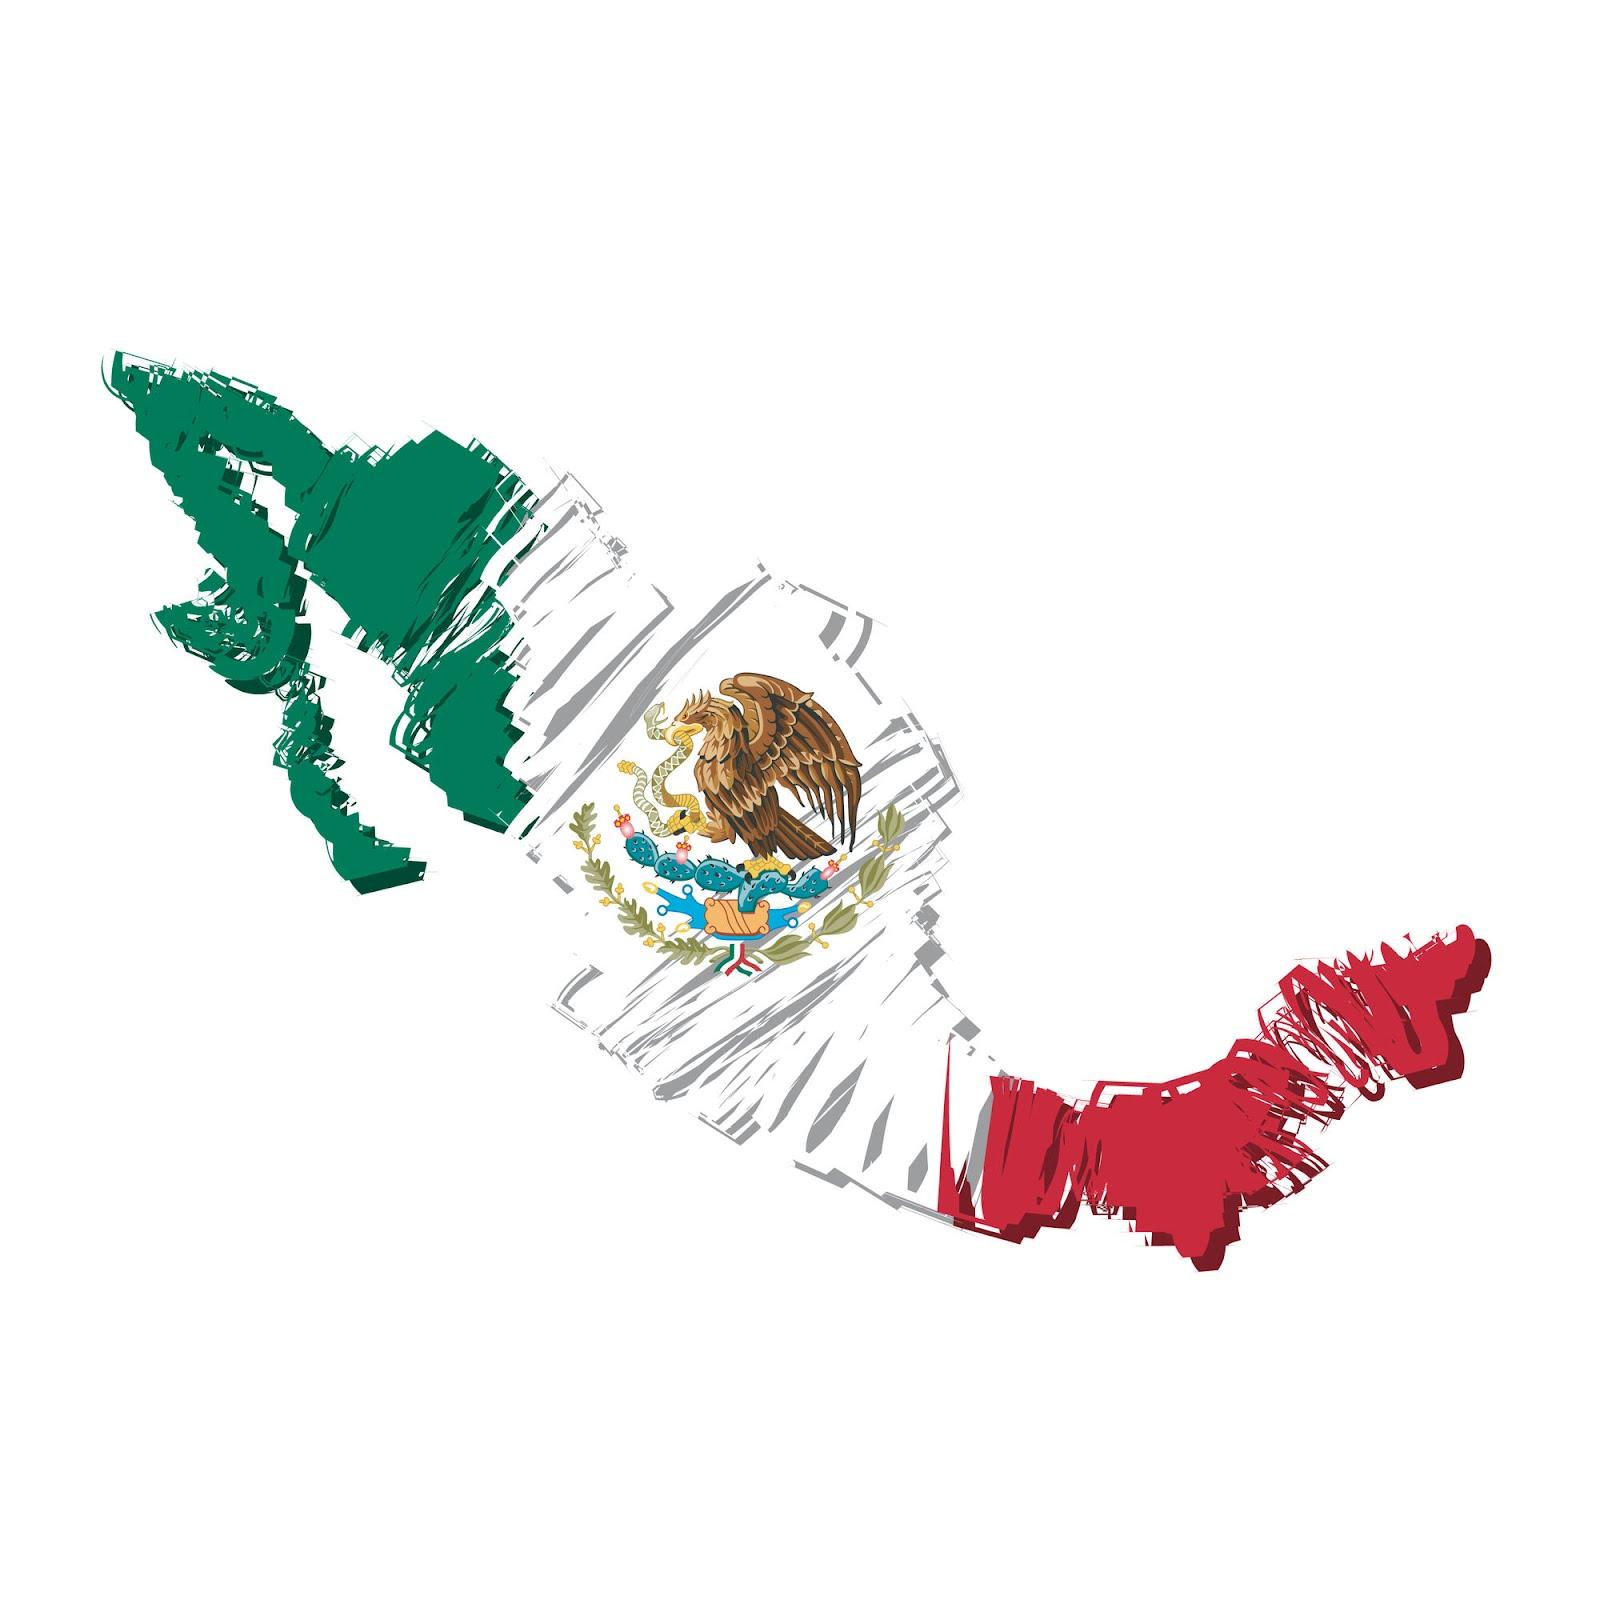 Mapa de México con Bandera Mexicana - Símbolos Patrios - 16 de